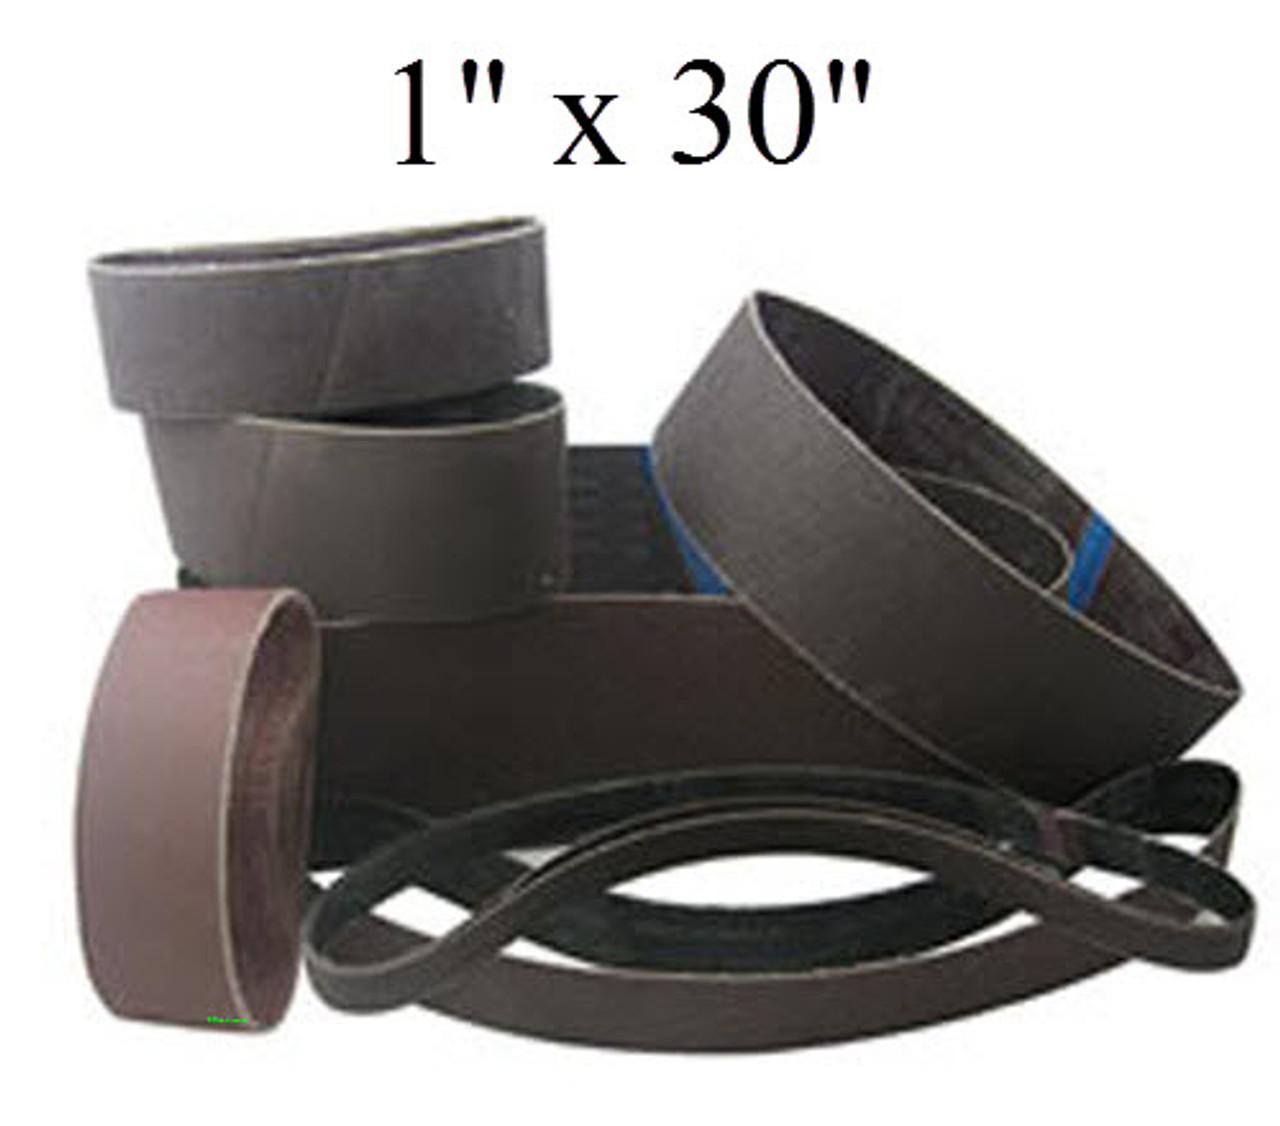 20 Pack 1//2 X 12 Inch 120 Grit Aluminum Oxide Air File Sanding Belts